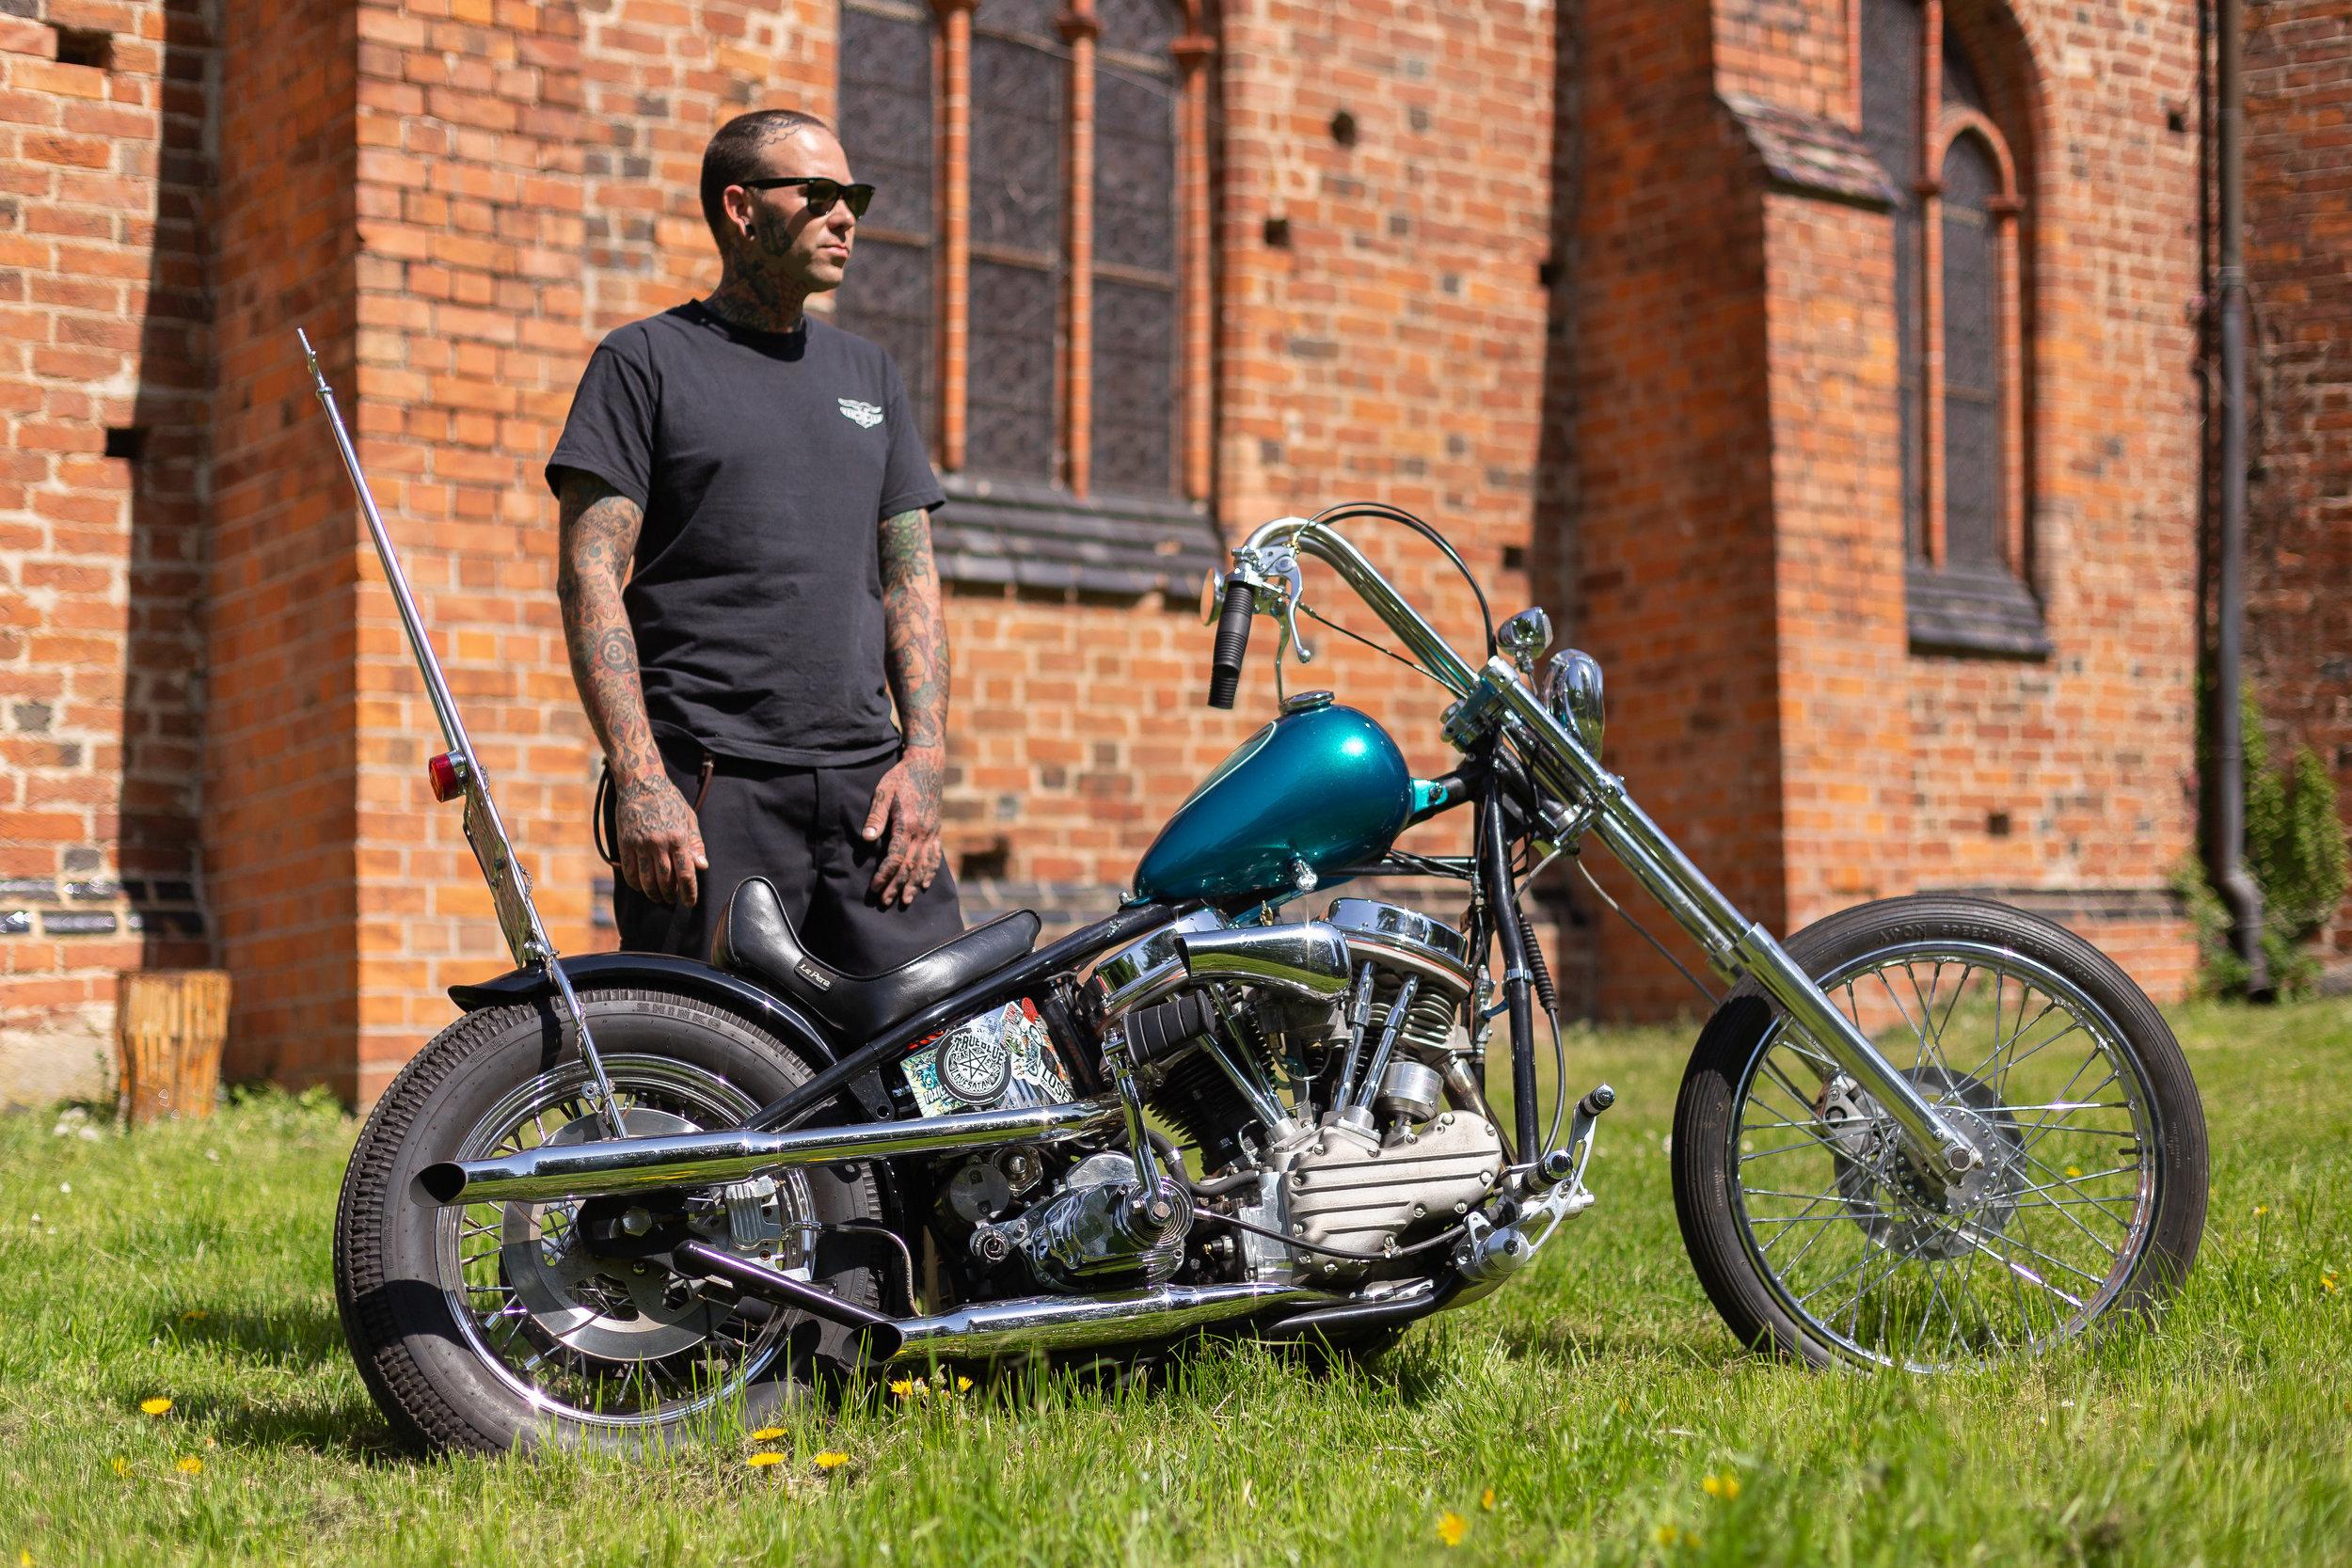 (c) Stefan Weidner Fotografie_Toxic Bikes_Karls Ofen_10-05-2018_IMG-0135.jpg